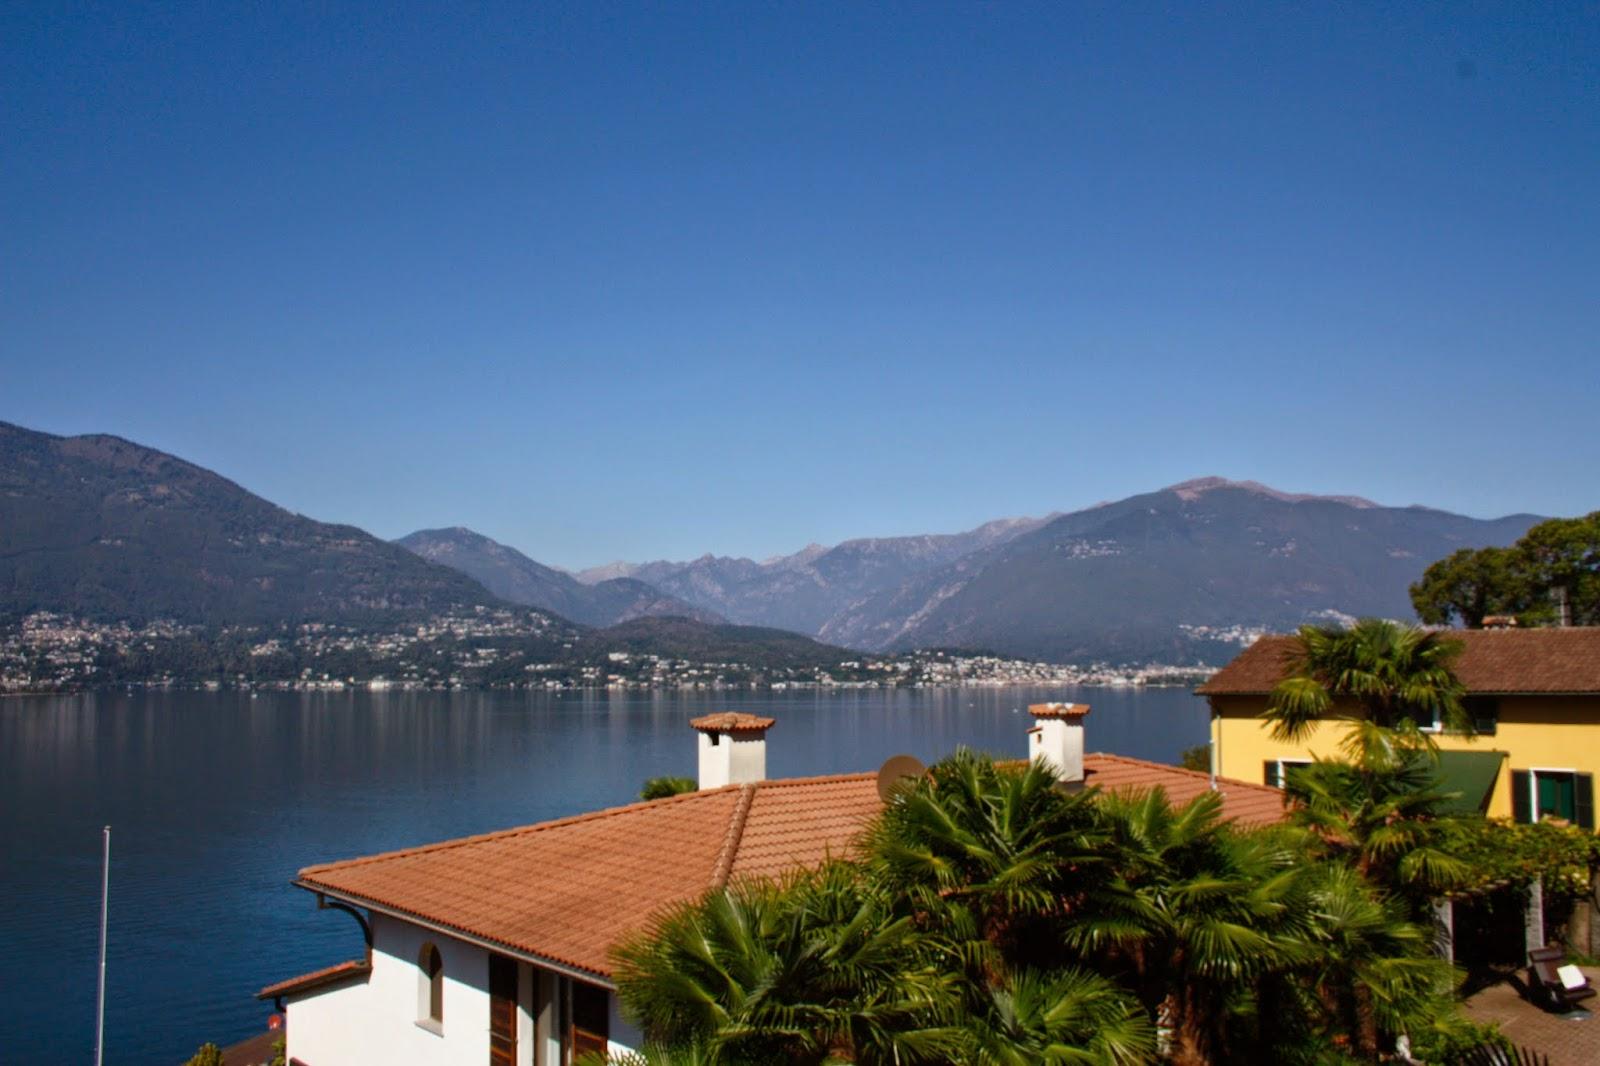 Urlaub Reise Entspannung Hotel Anlage Ticino Laggo Magiore Seereise Spontanreise Reise Billigreise Ferienhaus Flussperle